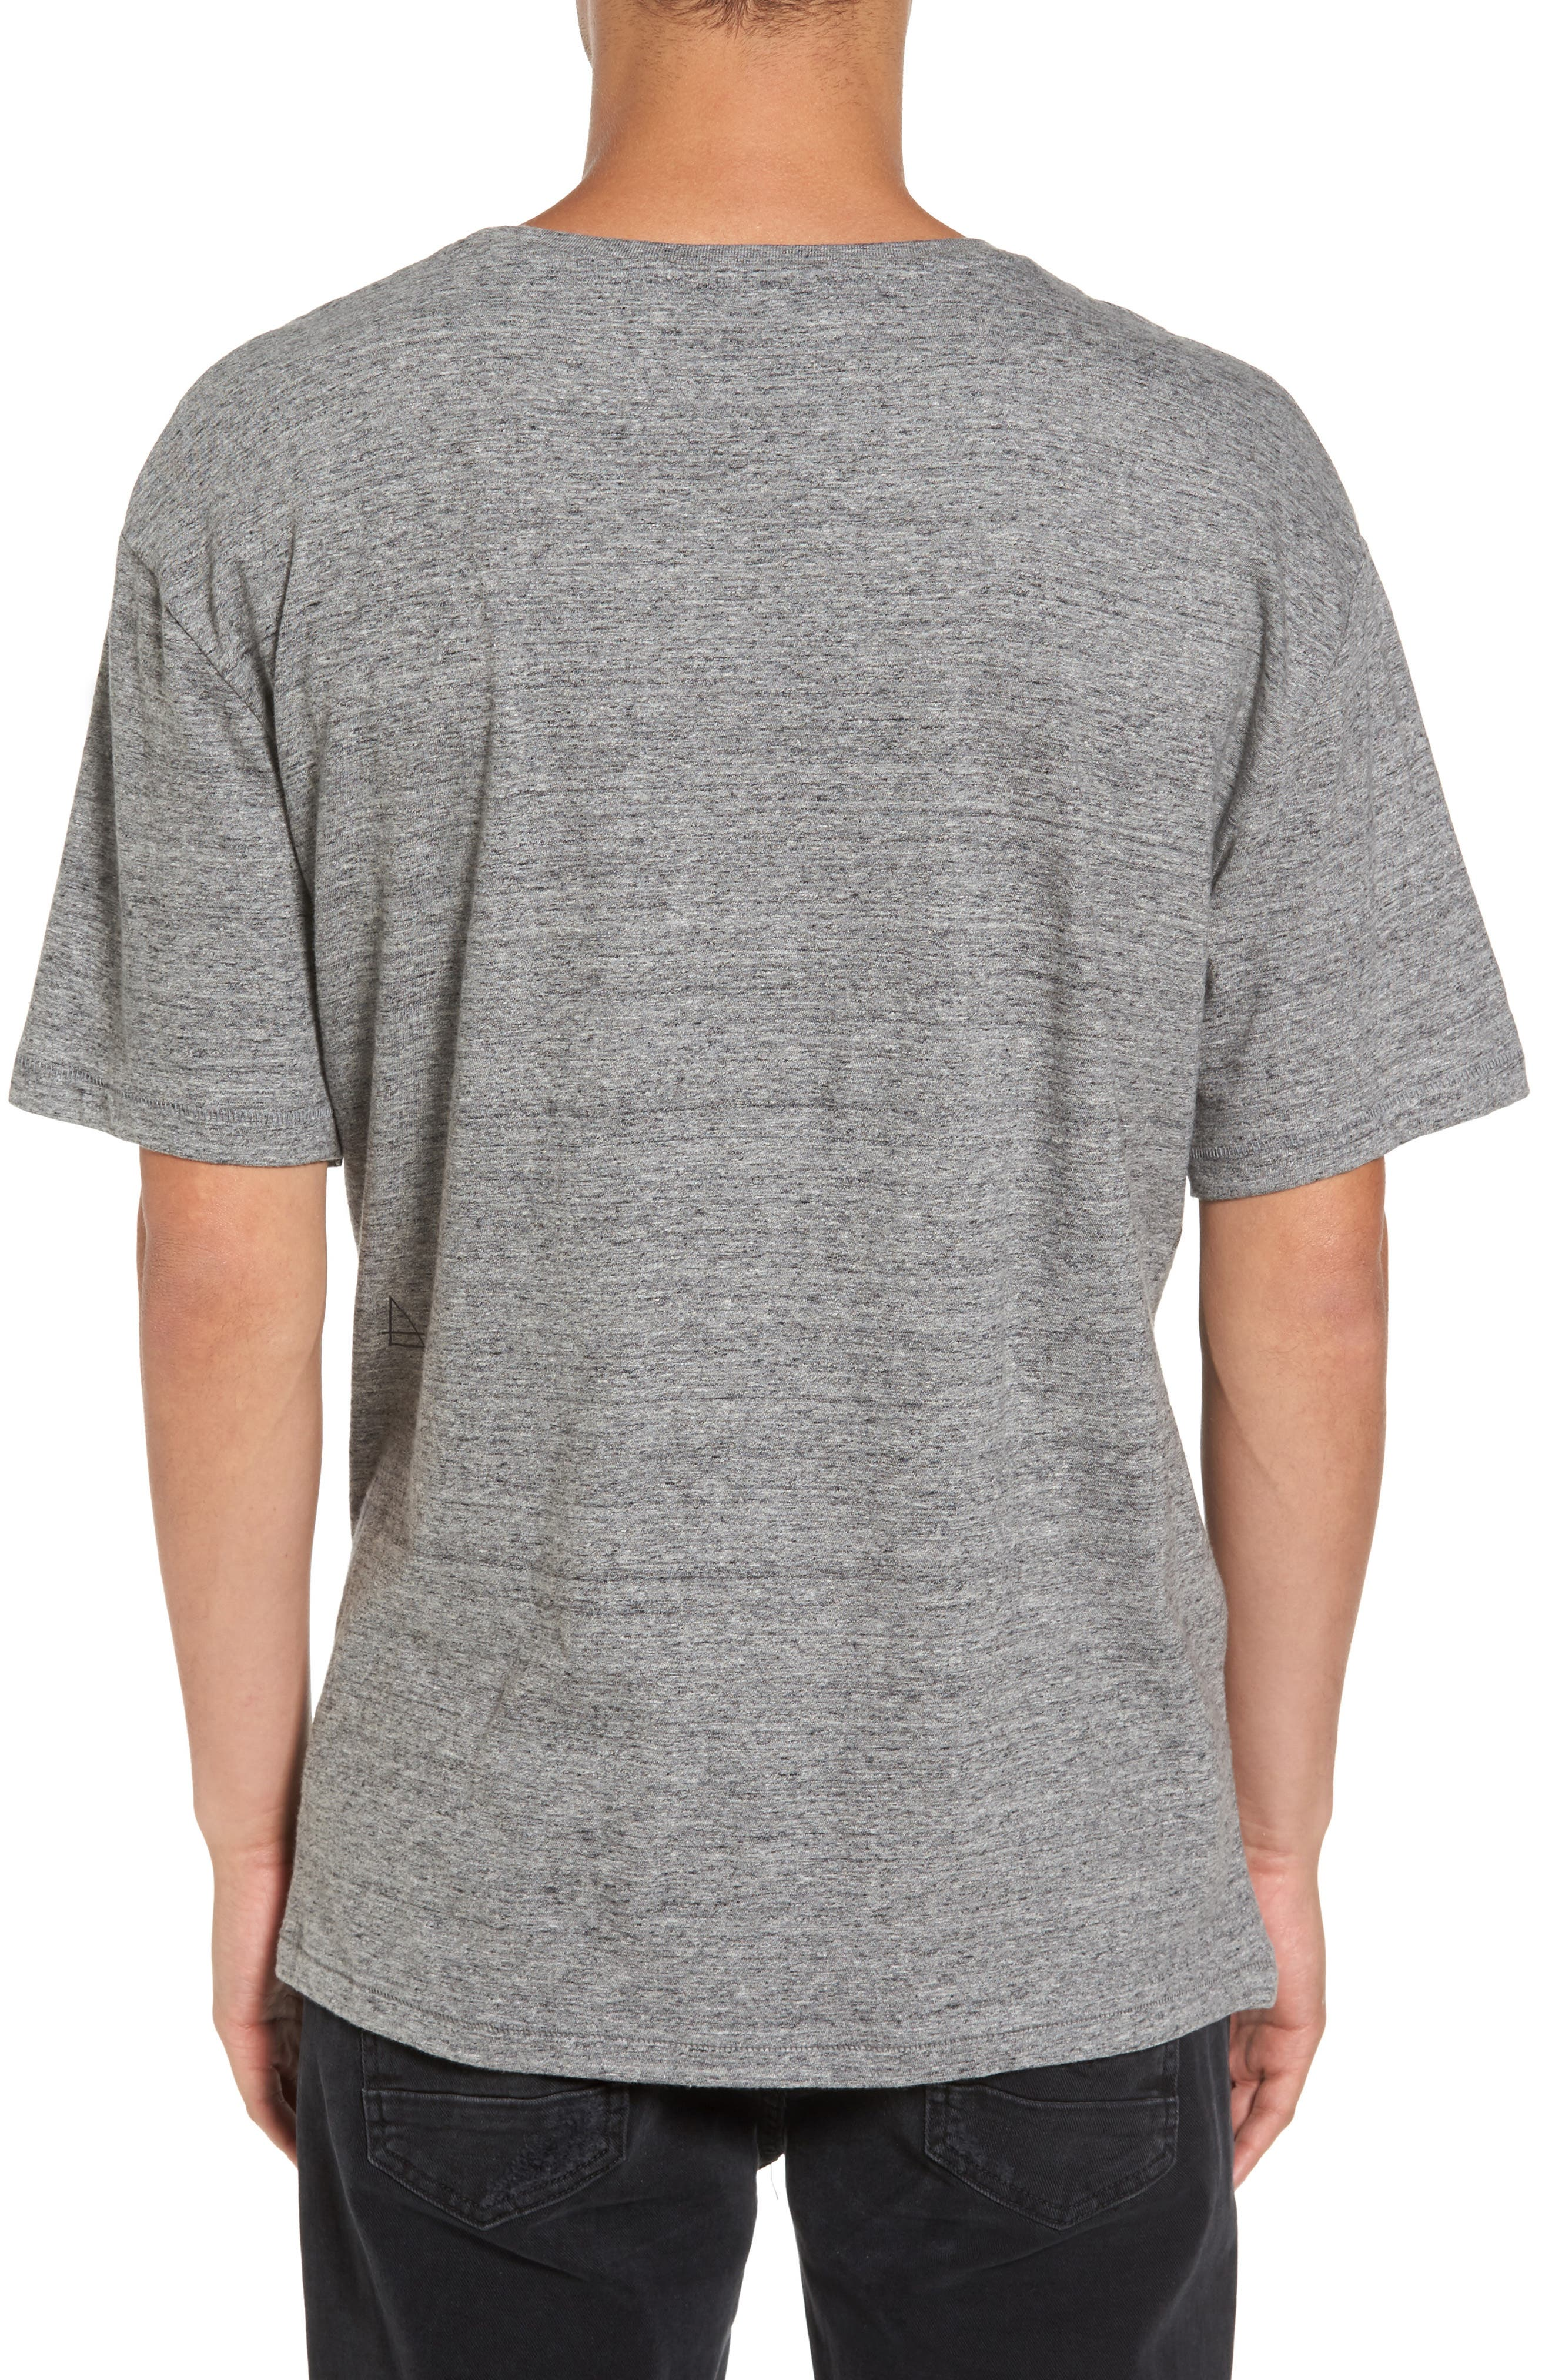 Savage T-Shirt,                             Alternate thumbnail 2, color,                             Grunder Grey